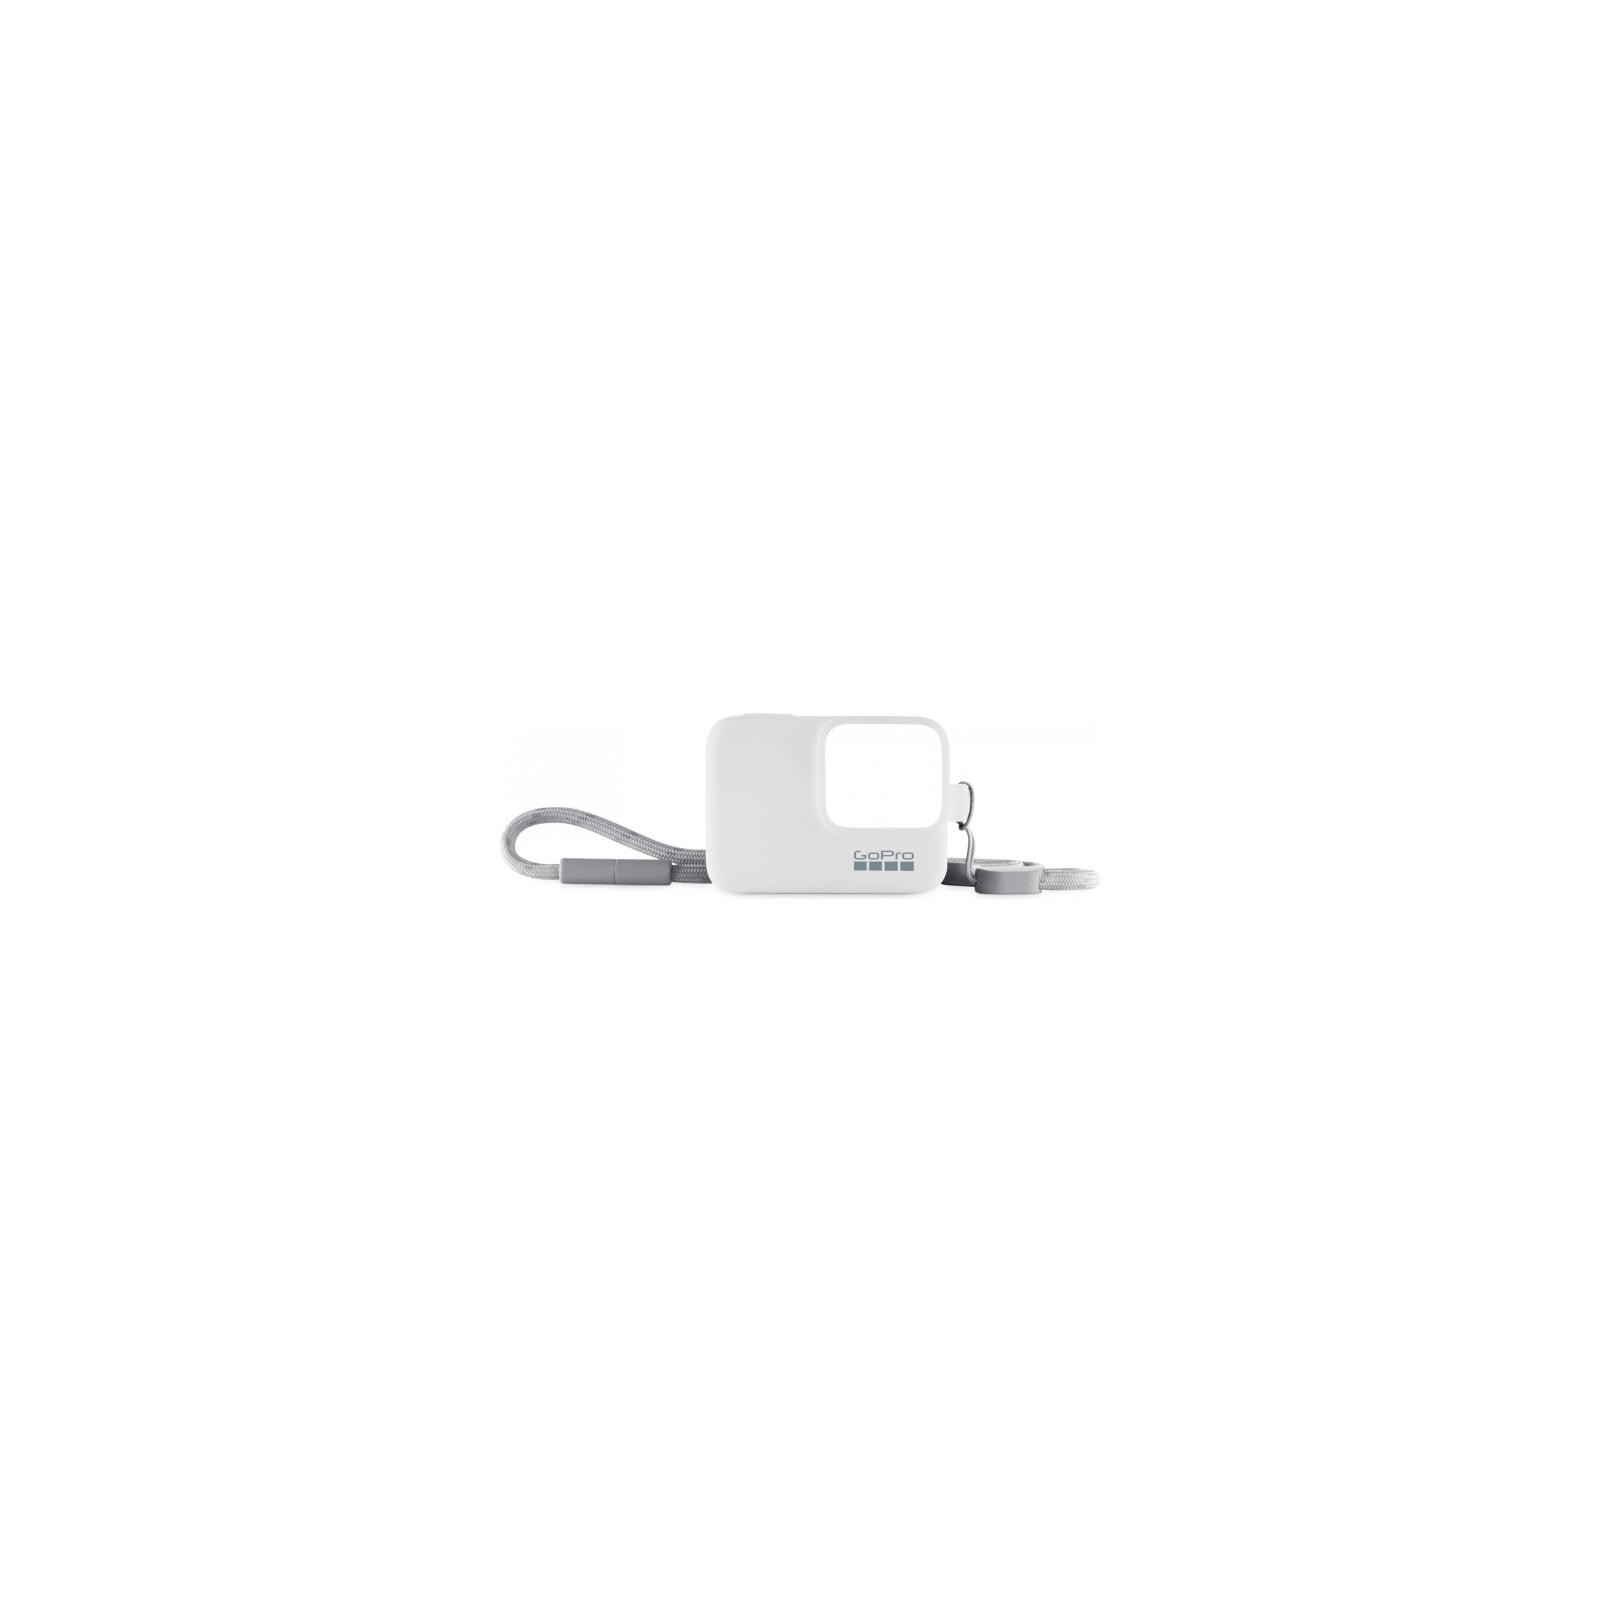 Аксессуар к экшн-камерам GoPro Sleeve & Lanyard (White) (ACSST-002)